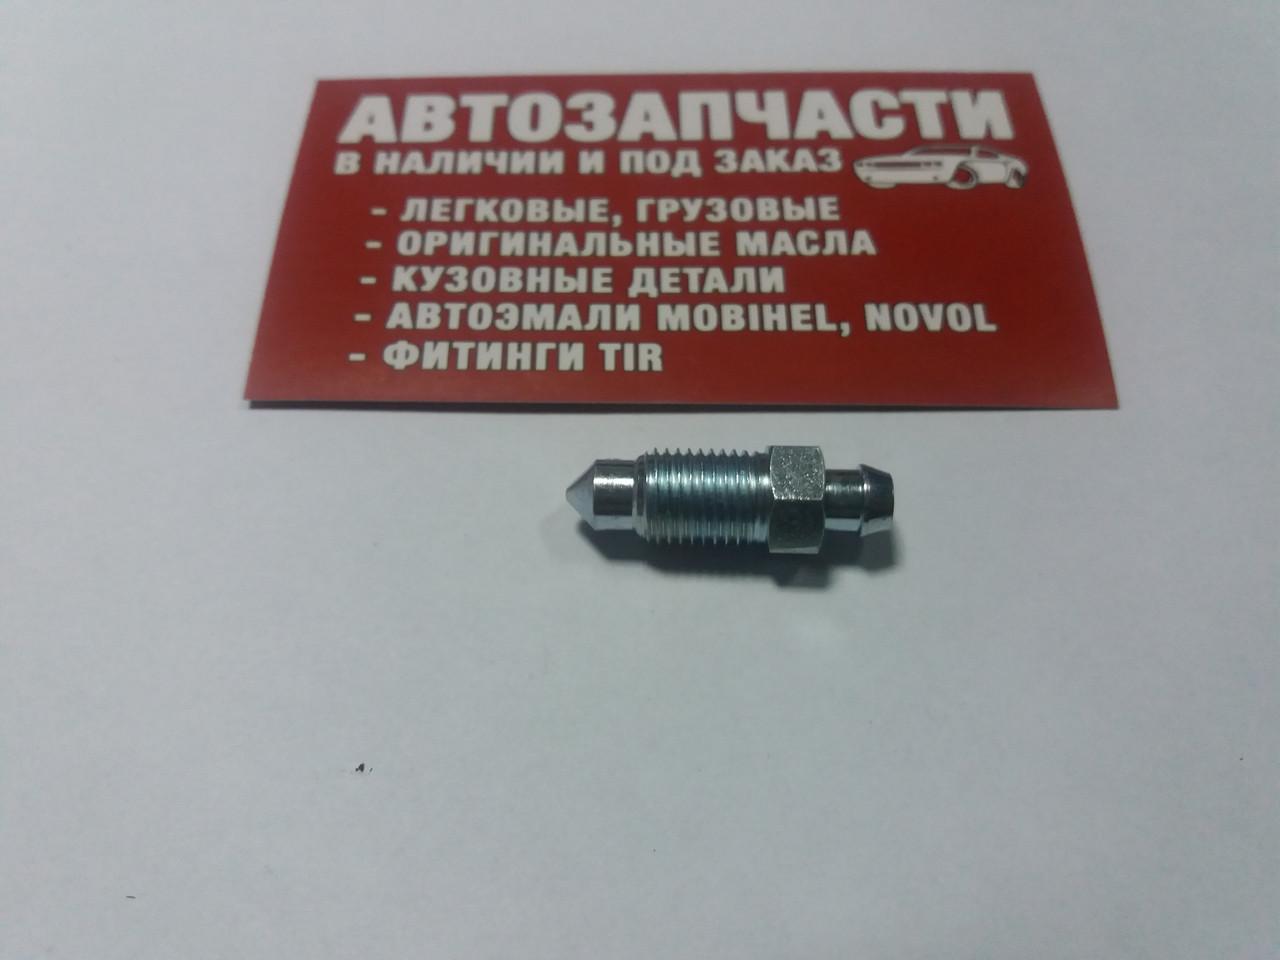 Штуцер прокачки М3/8 дюйма - 31 мм. QB0107